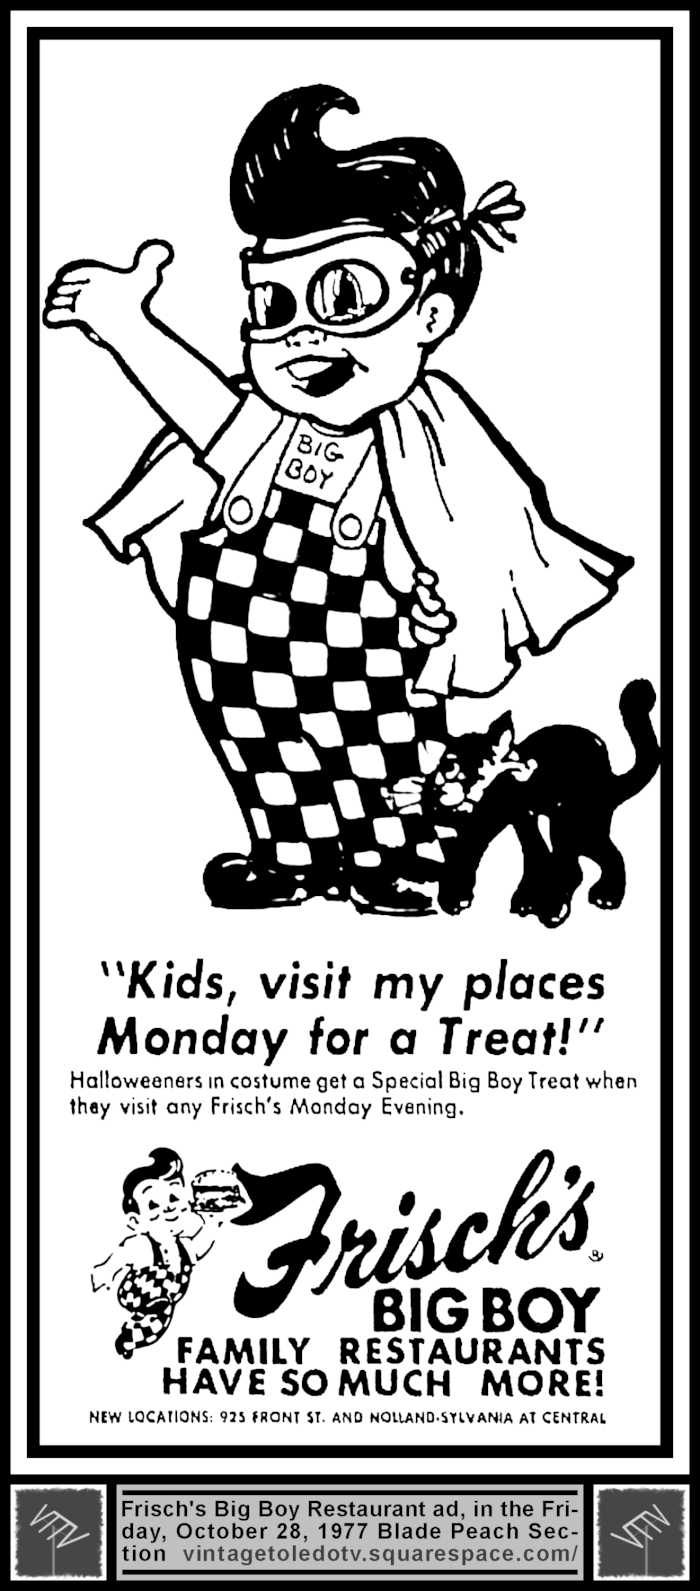 Frisch's Big Boy Family Restaurants (Fri 10/28/77 Halloween ...